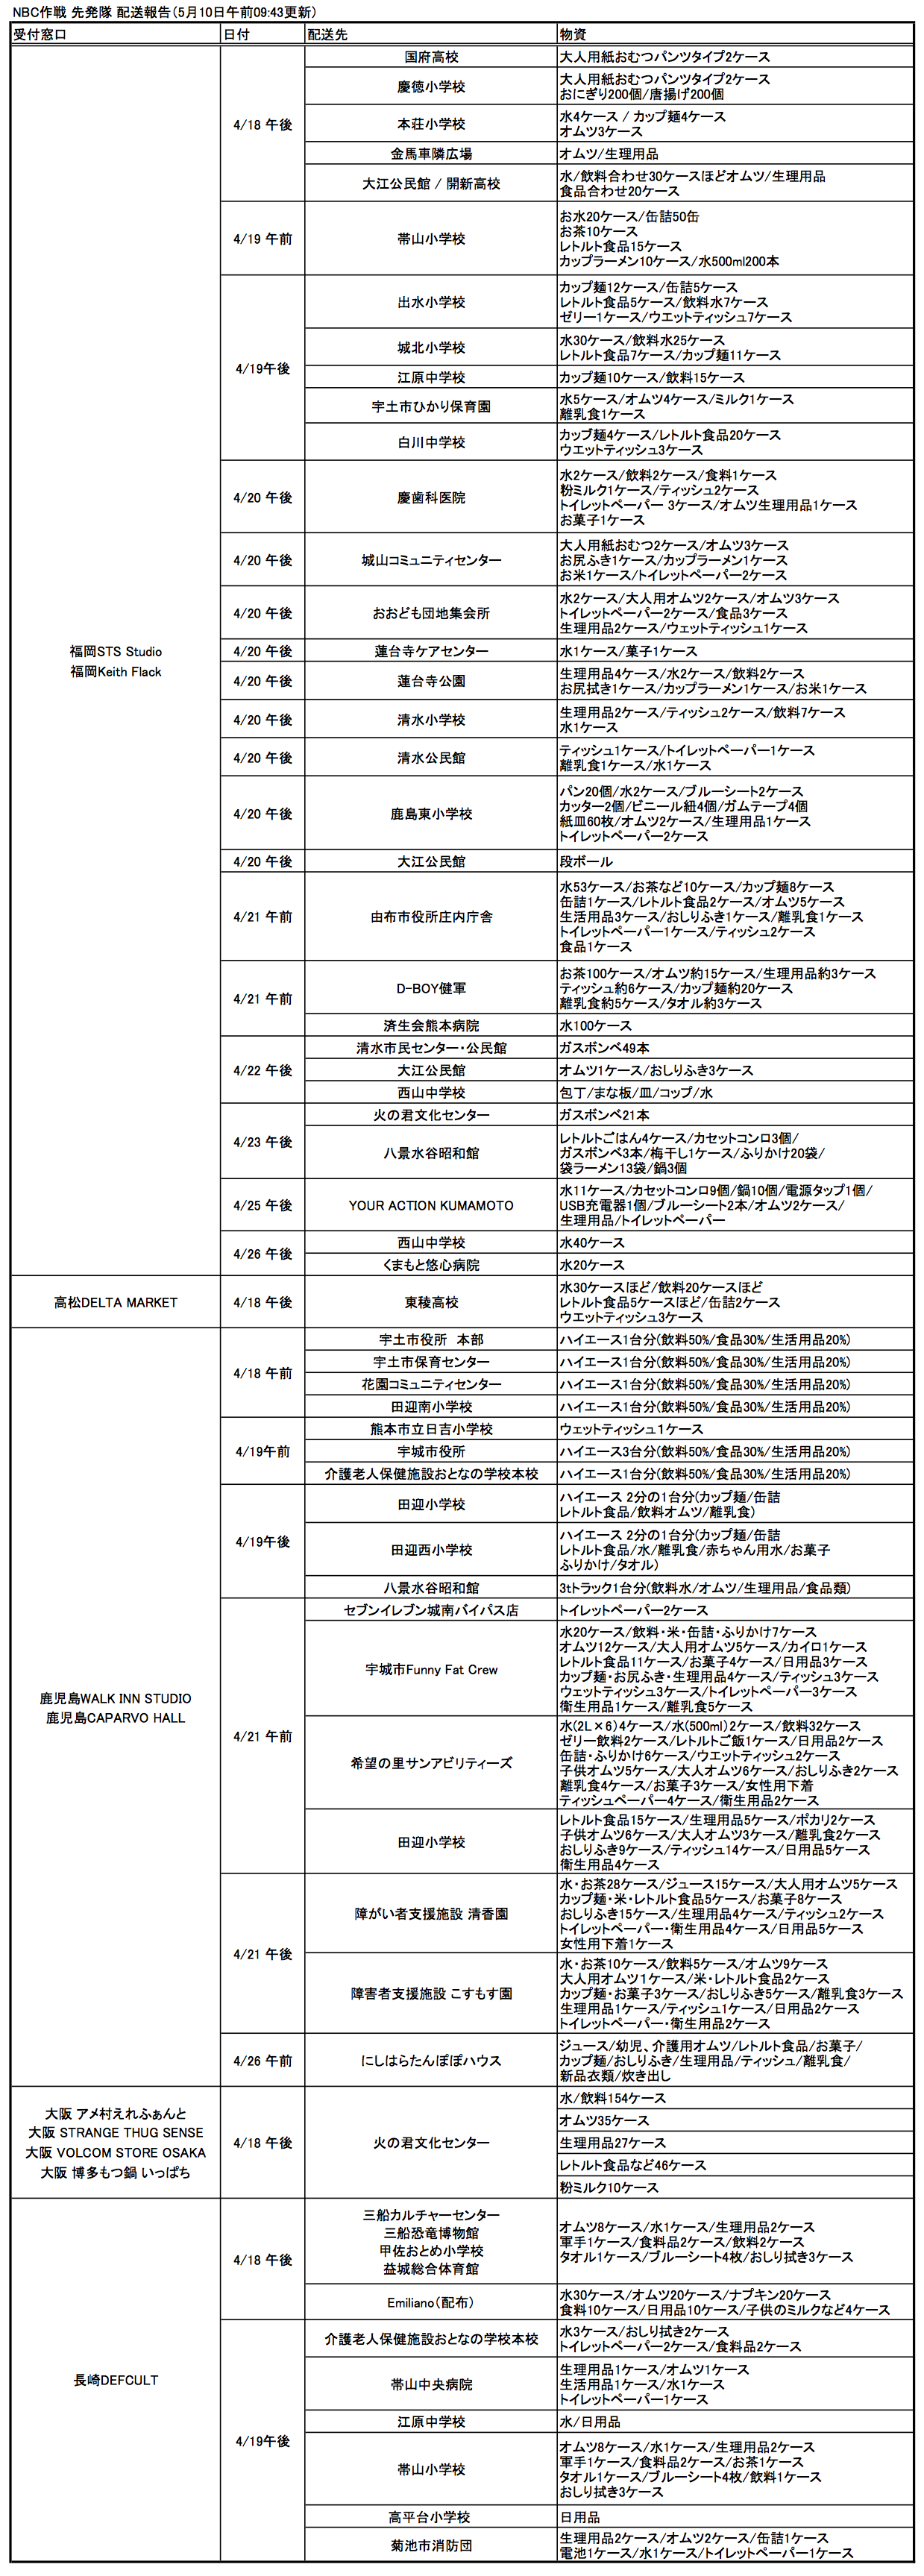 http://www.takeshihosomi.com/blog/2016/05/10/NBC%E4%BD%9C%E6%88%A6%E3%80%80%E6%B4%BB%E5%8B%95%E5%A0%B1%E5%91%8A0510.png